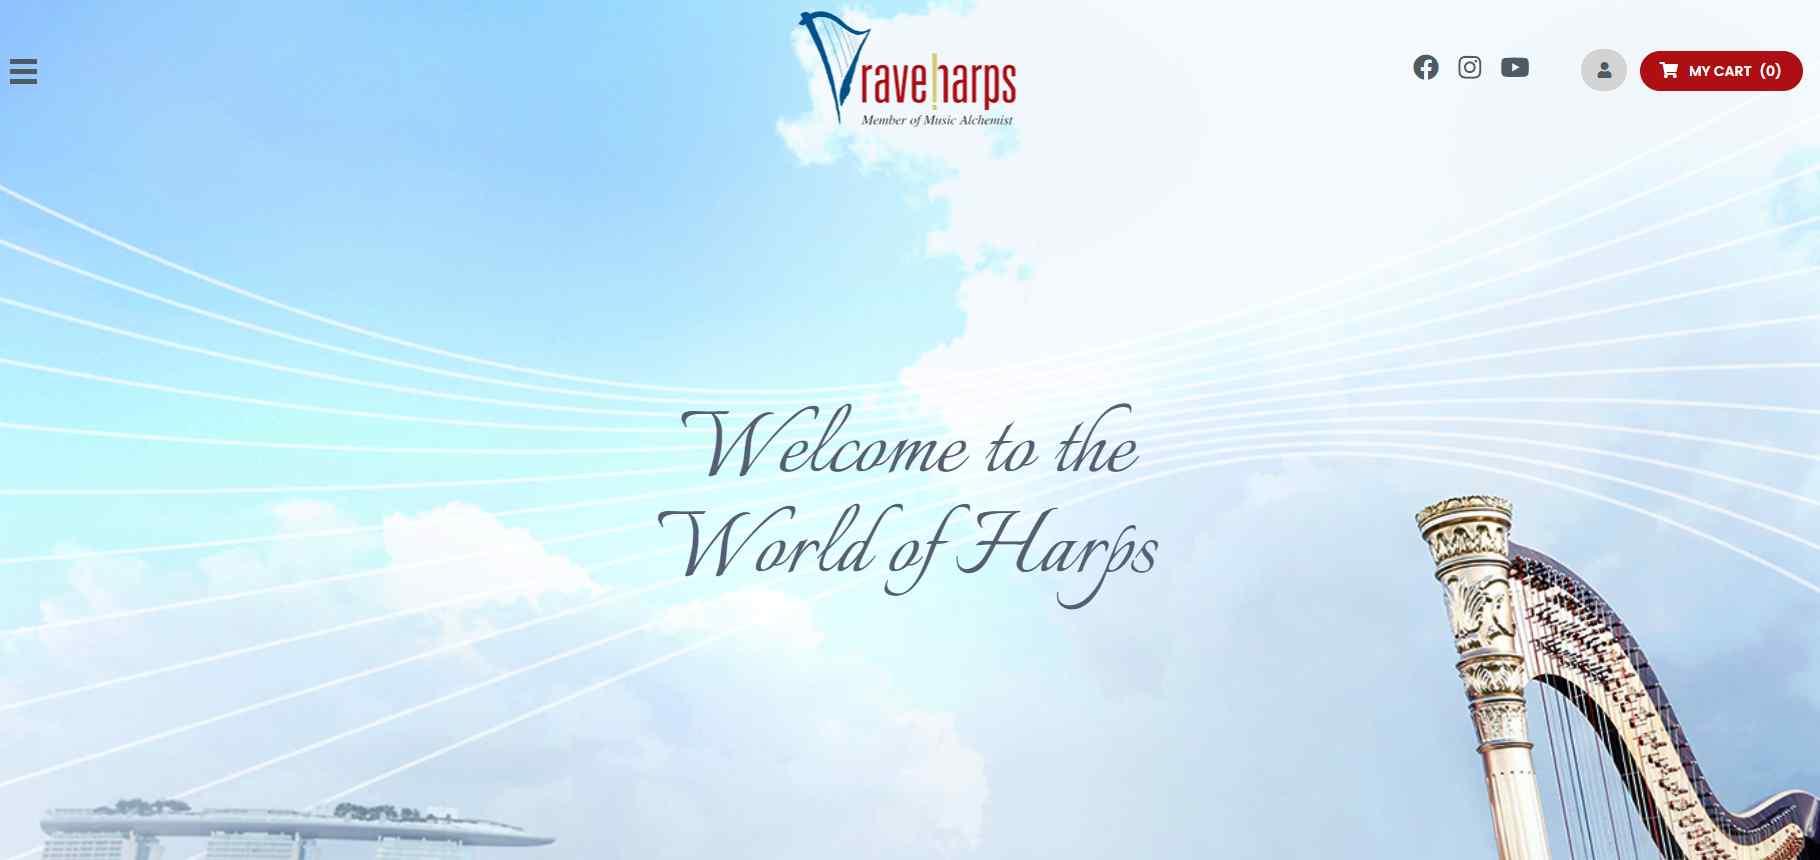 rave harps Top Music Schools in Singapore